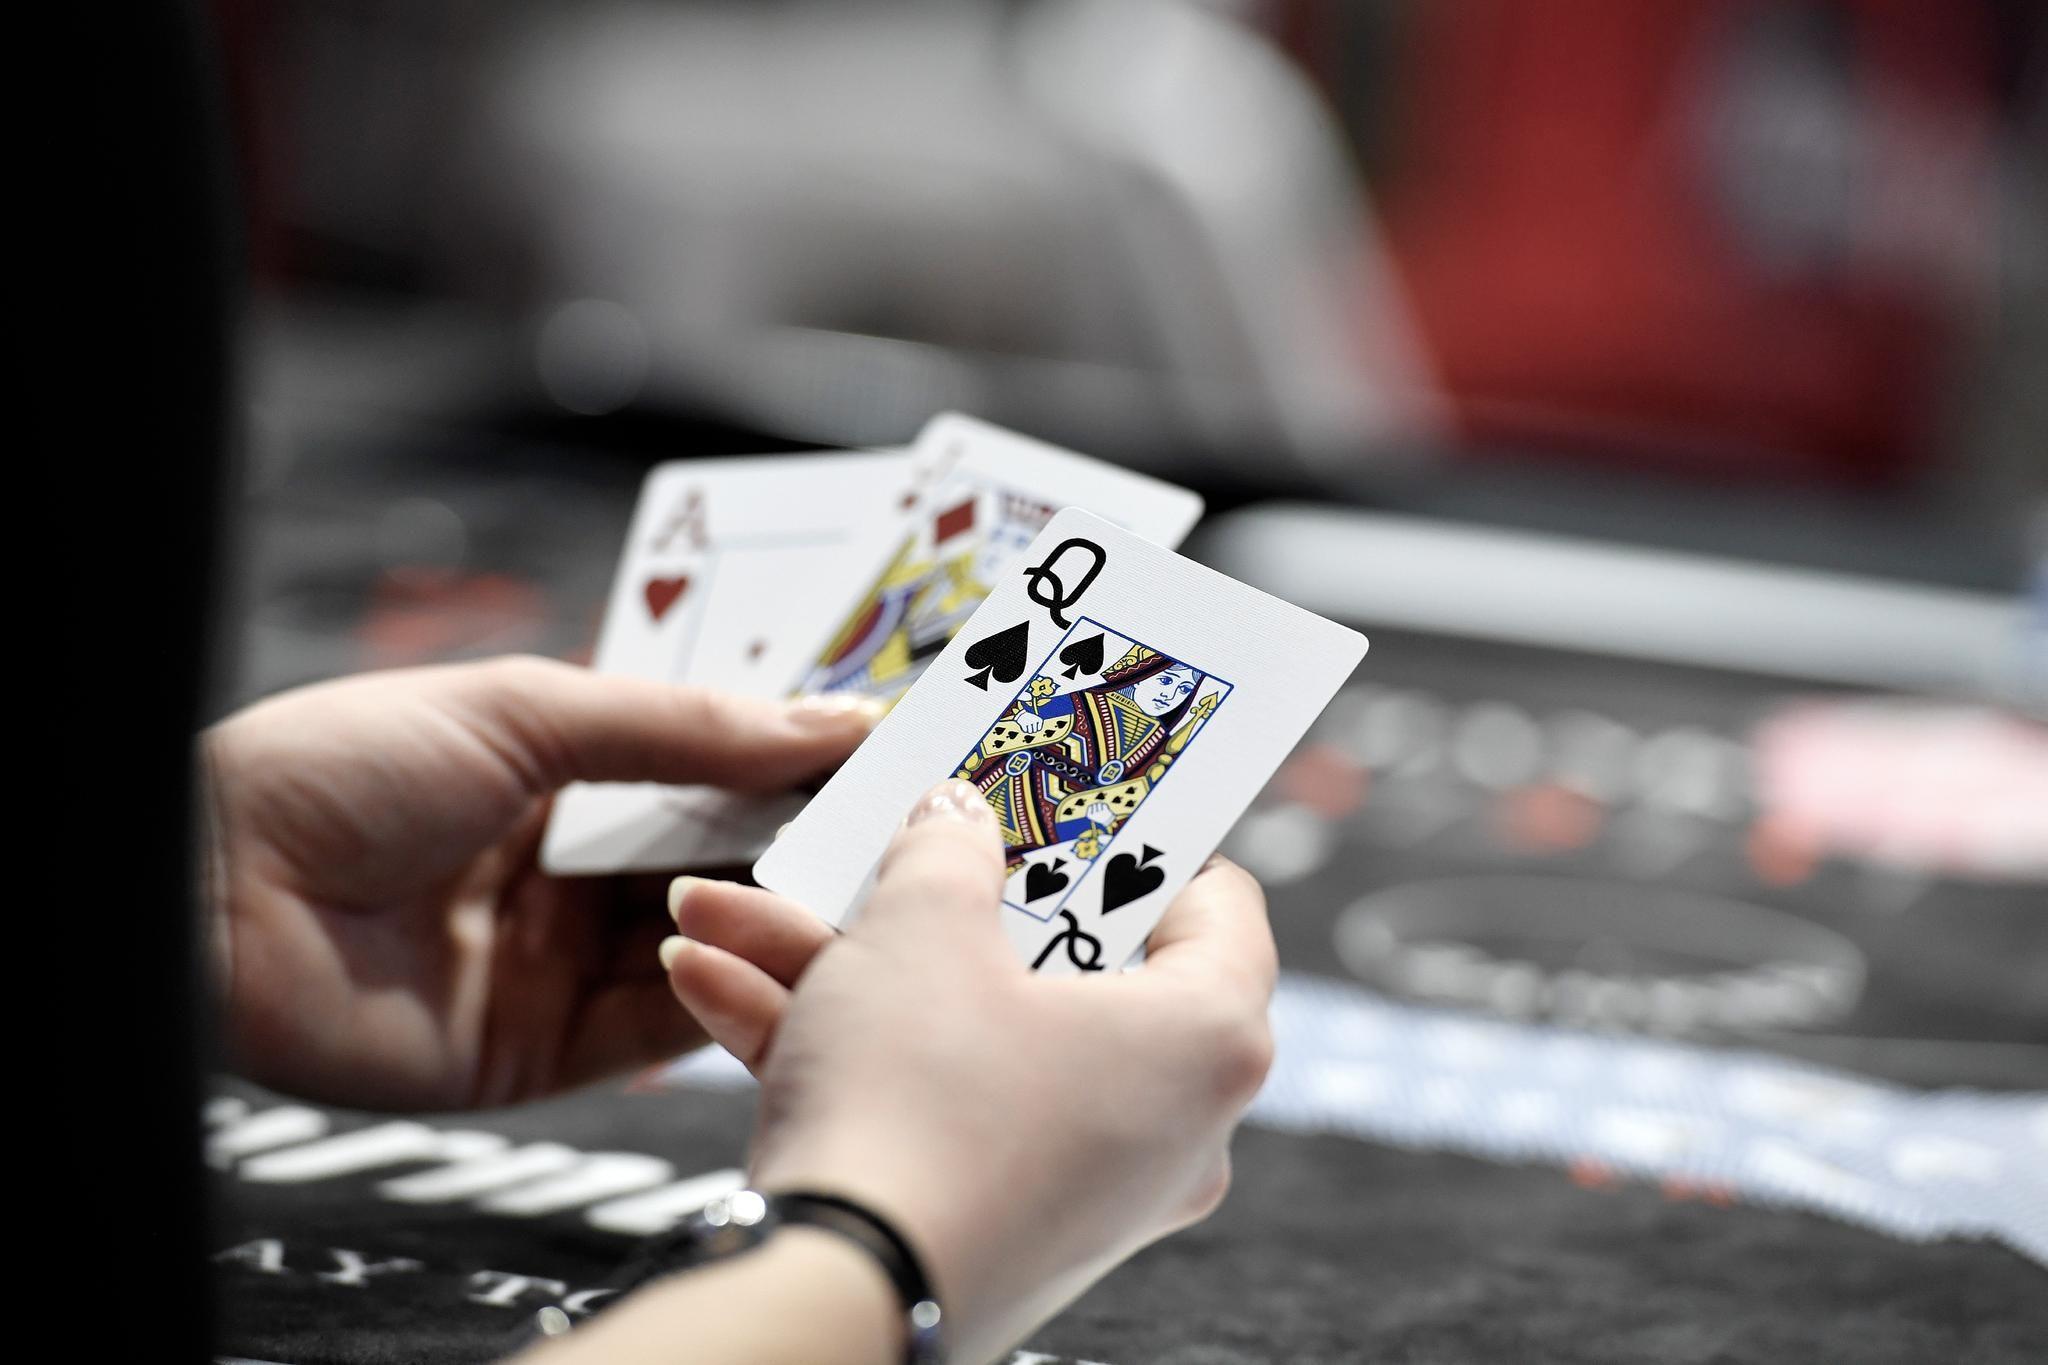 Pop-up talks on Responsible Gambling